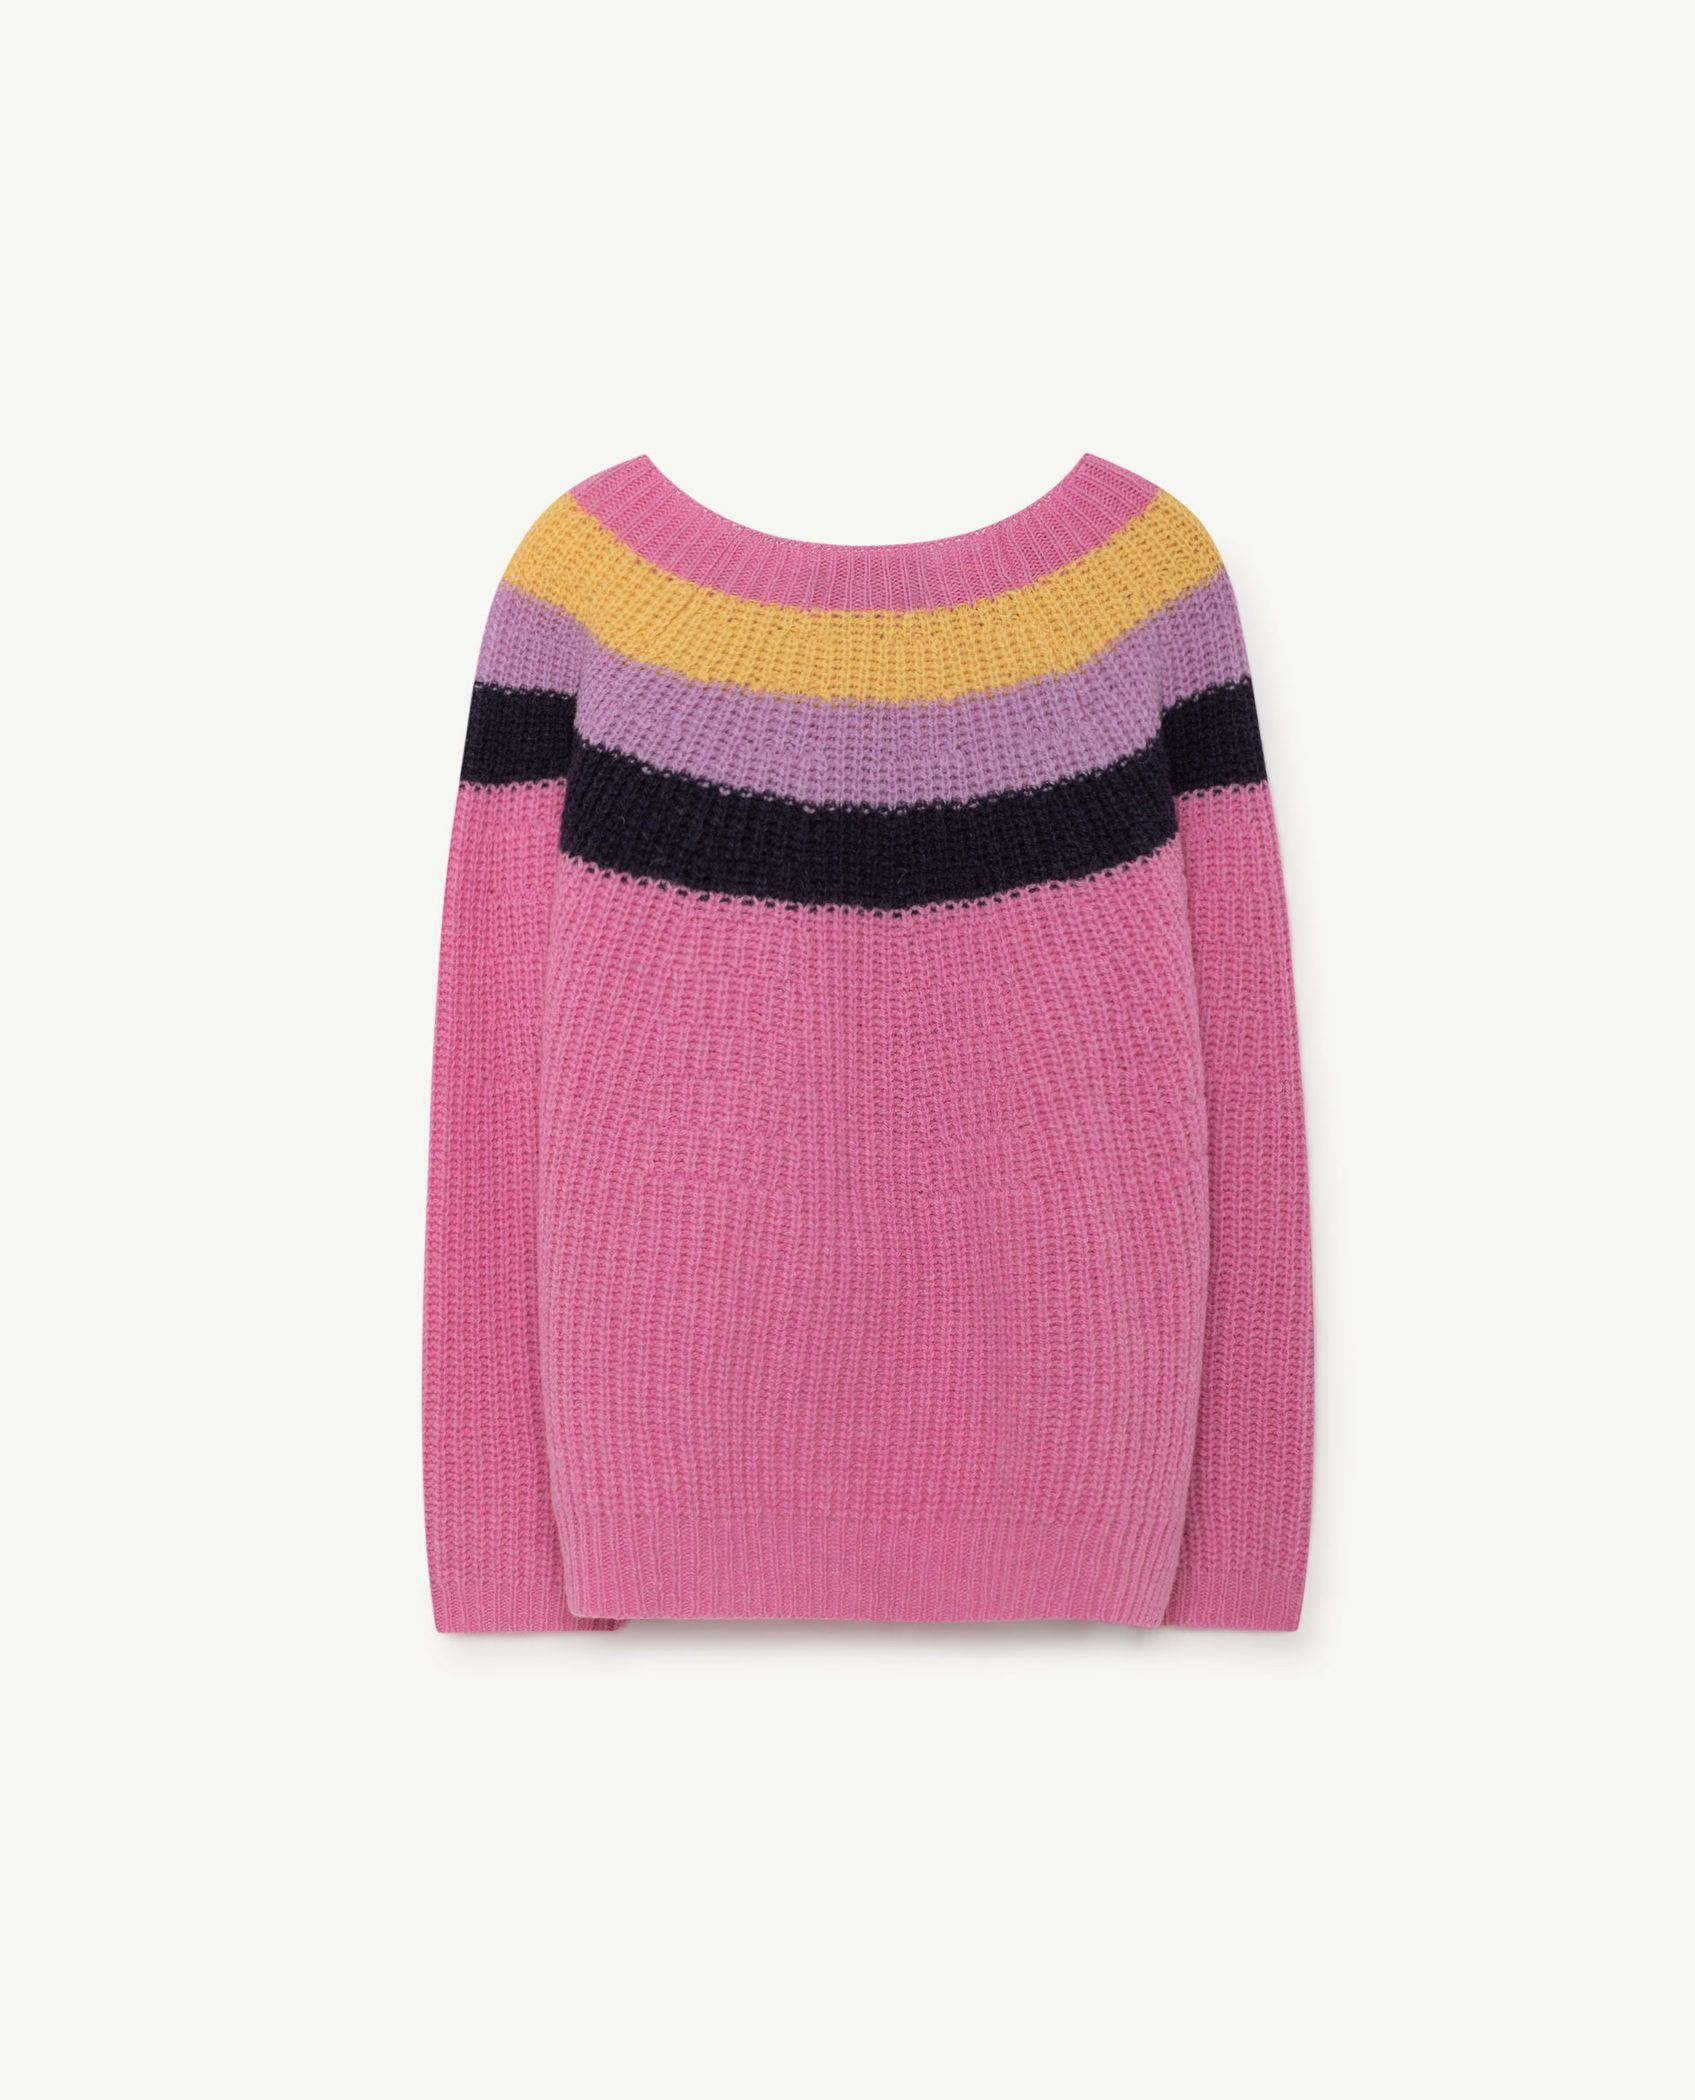 dffac06a5 Kids Knitted Raven Sweater TAO 2018 Baby Boys Girls Knitwear Long ...